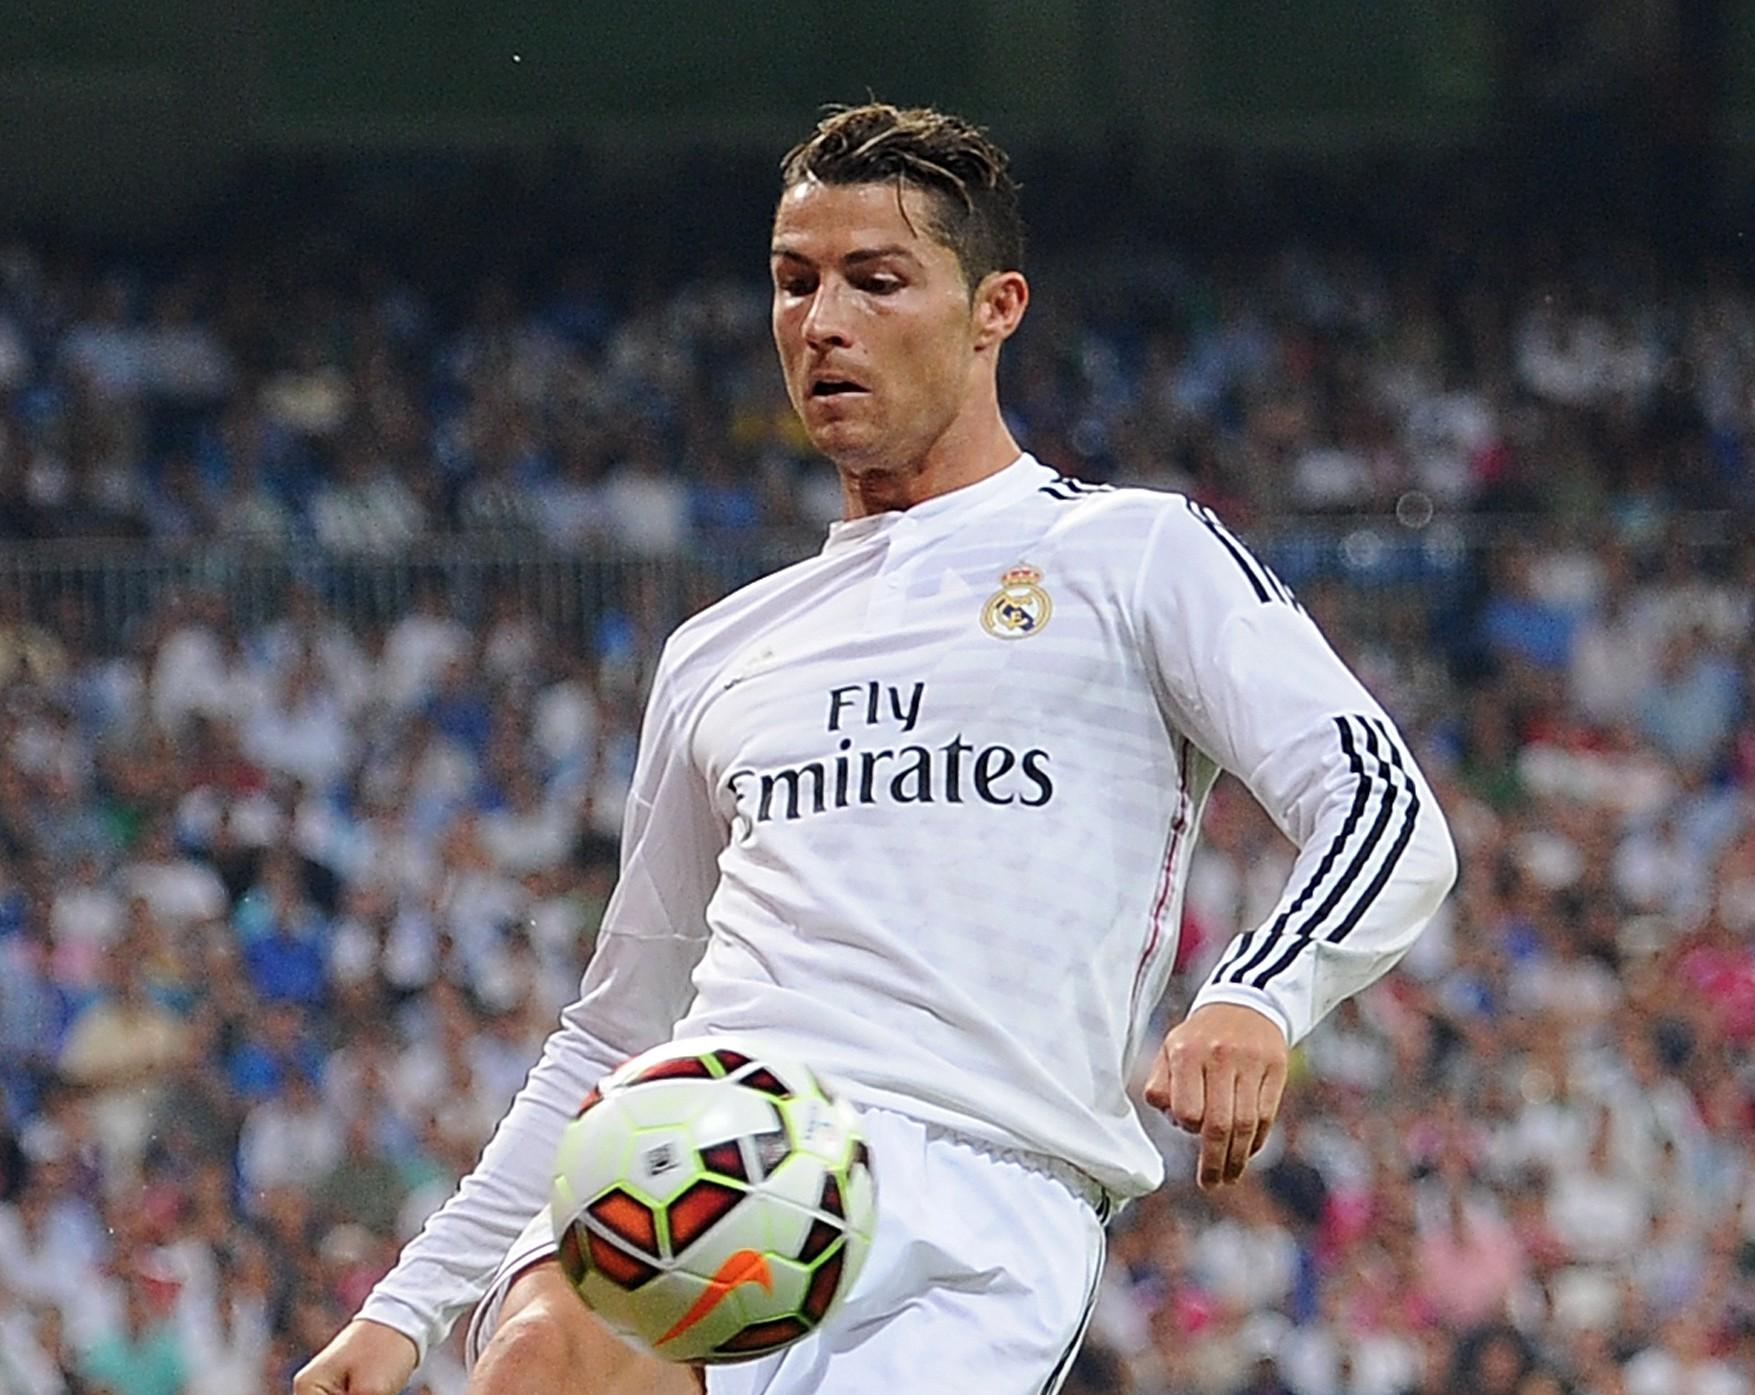 Real Madrid CF v Cordoba CF - La Liga